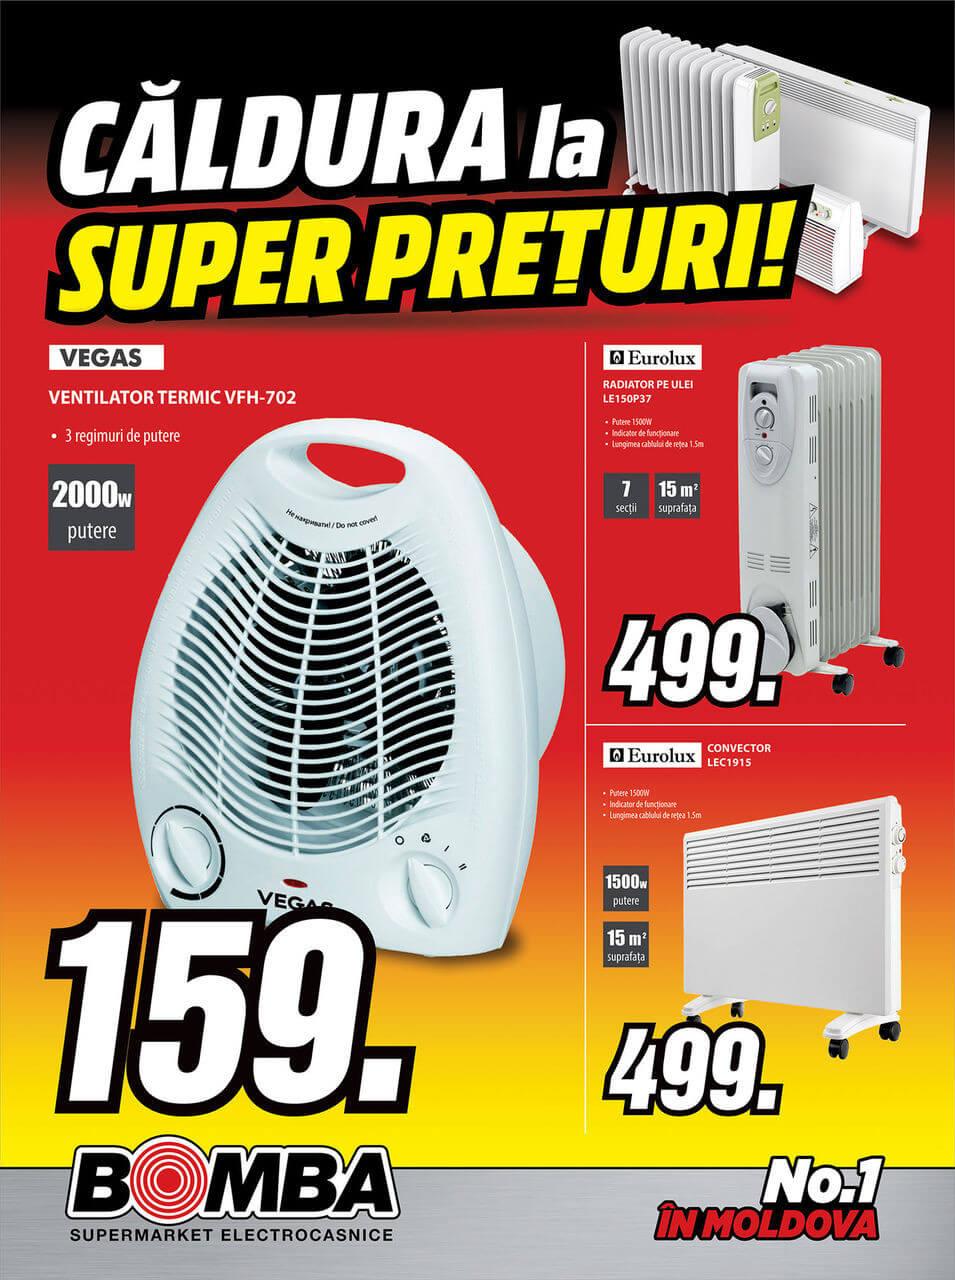 Bomba: Căldura la superprețuri!